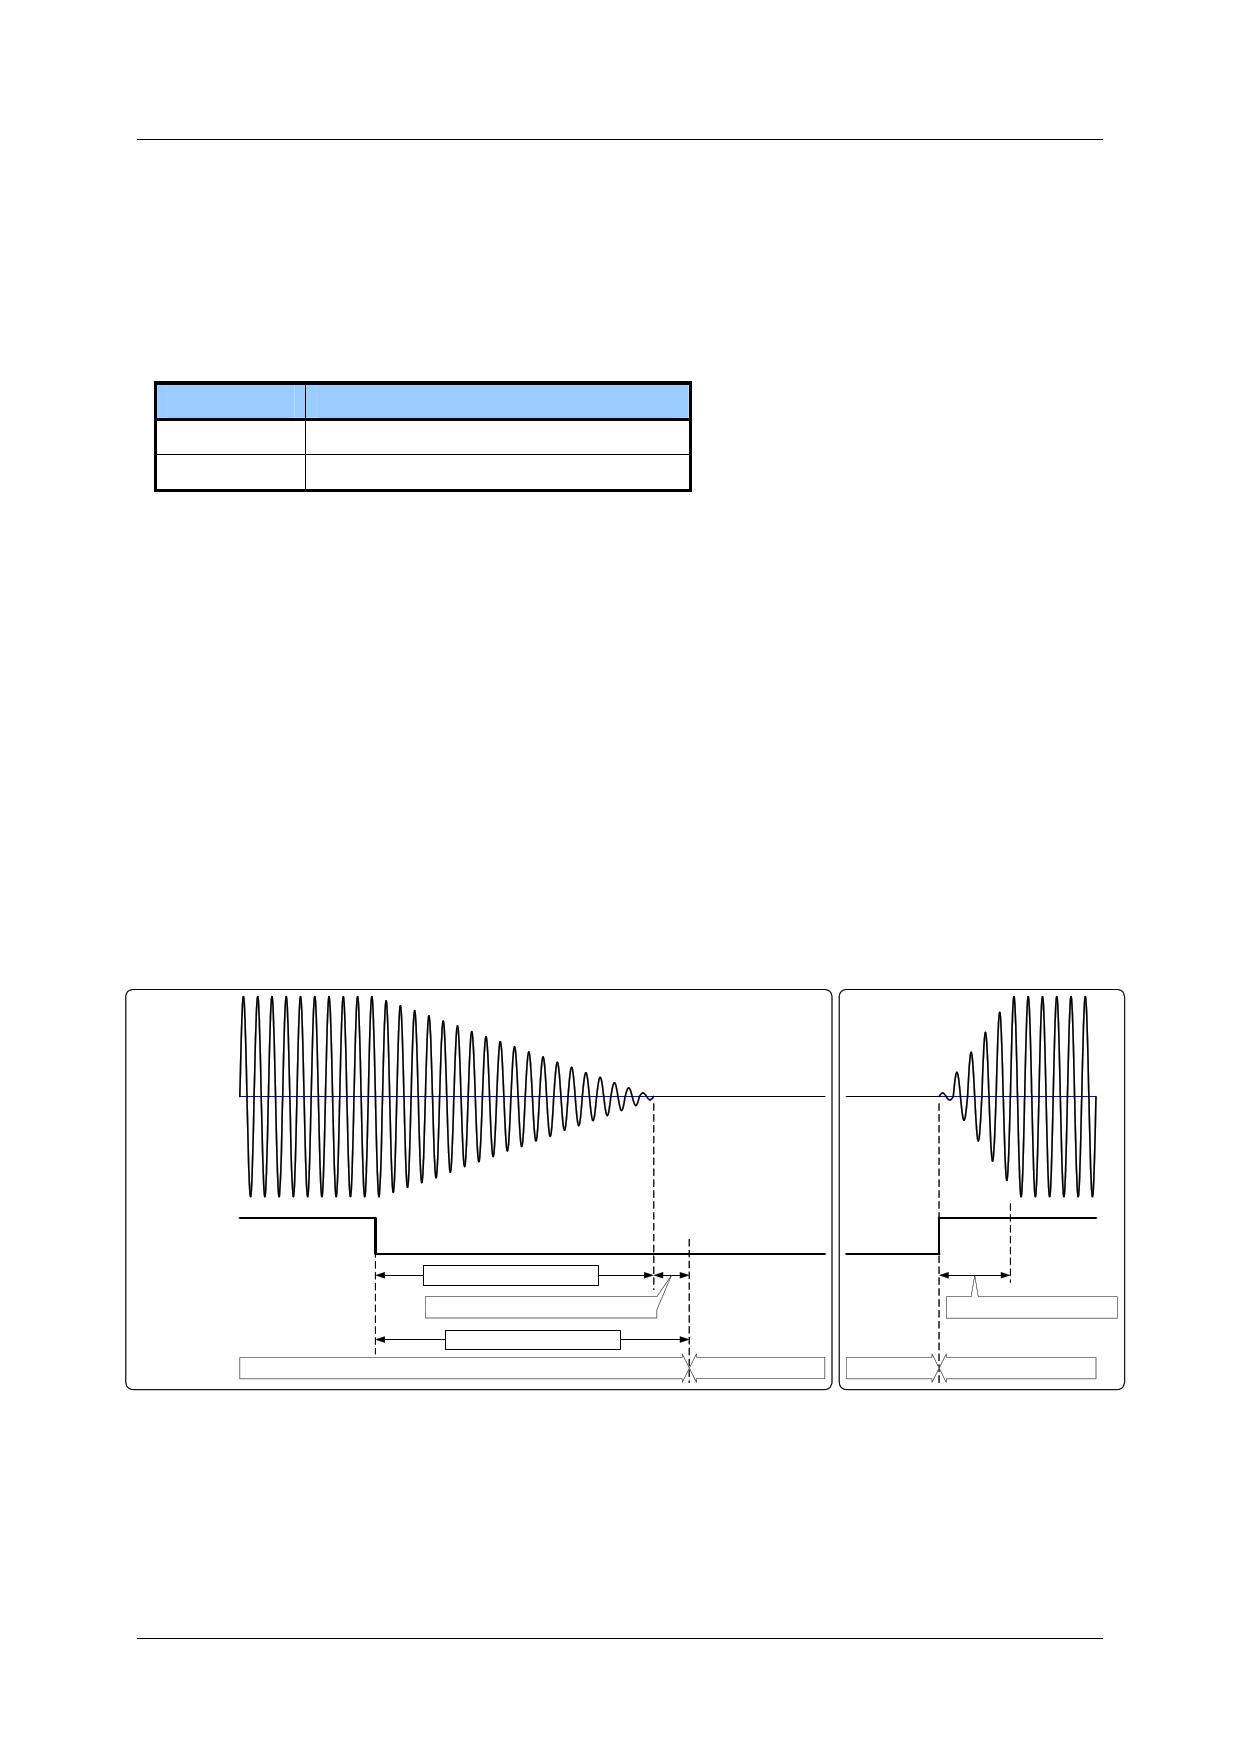 YDA176 transistor, igbt